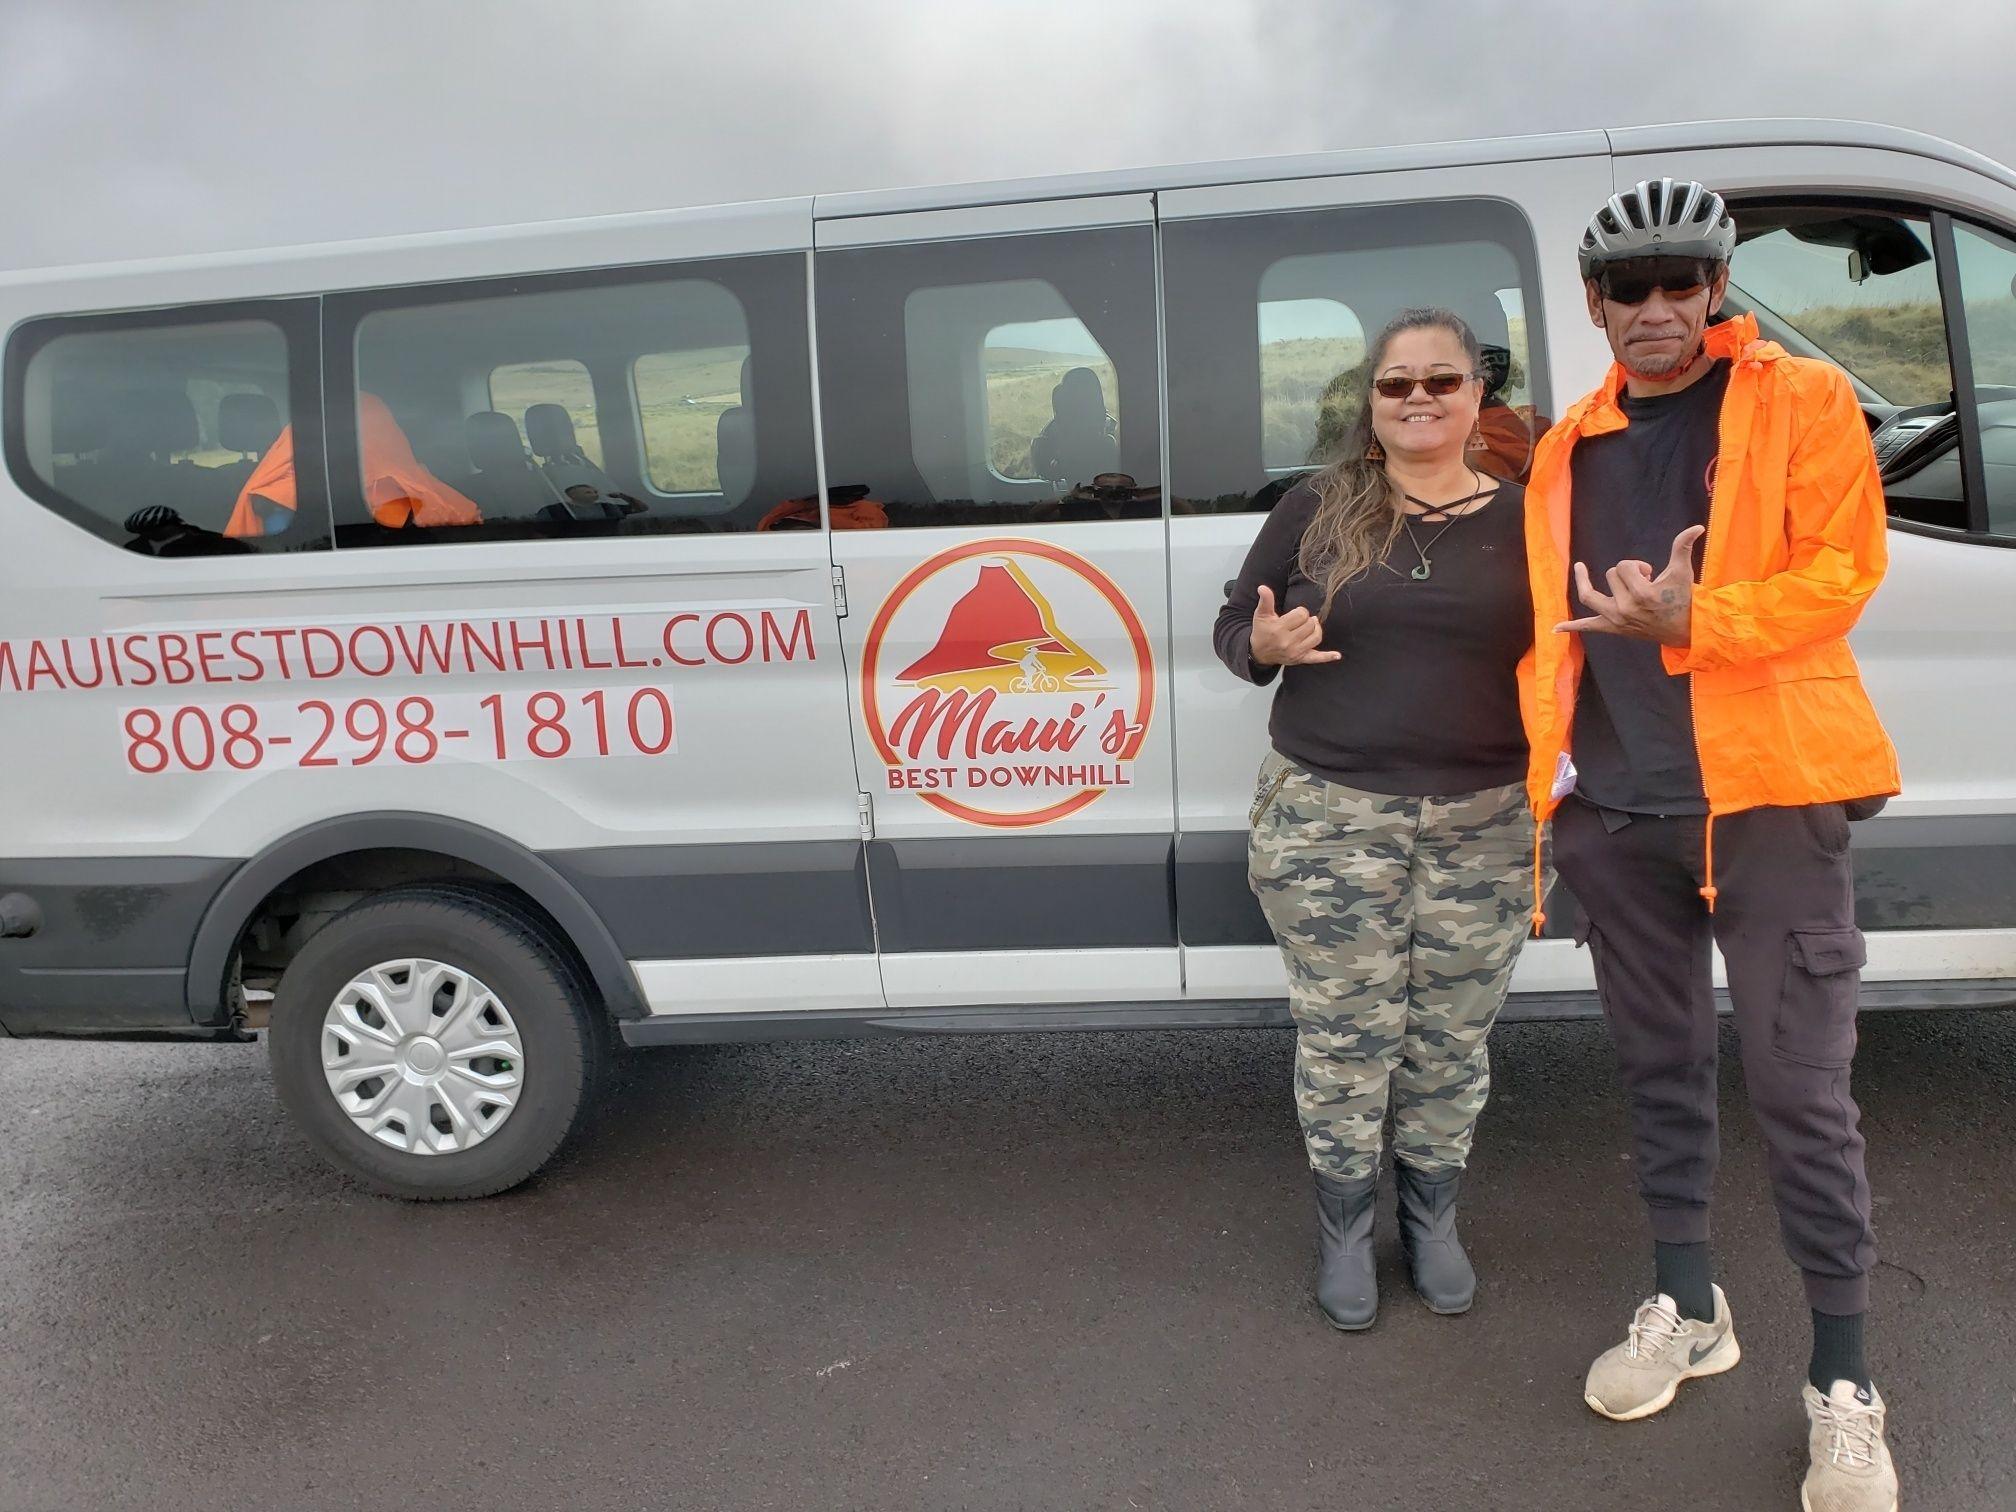 Haleakala Afternoon Guided Downhill Bike Tour